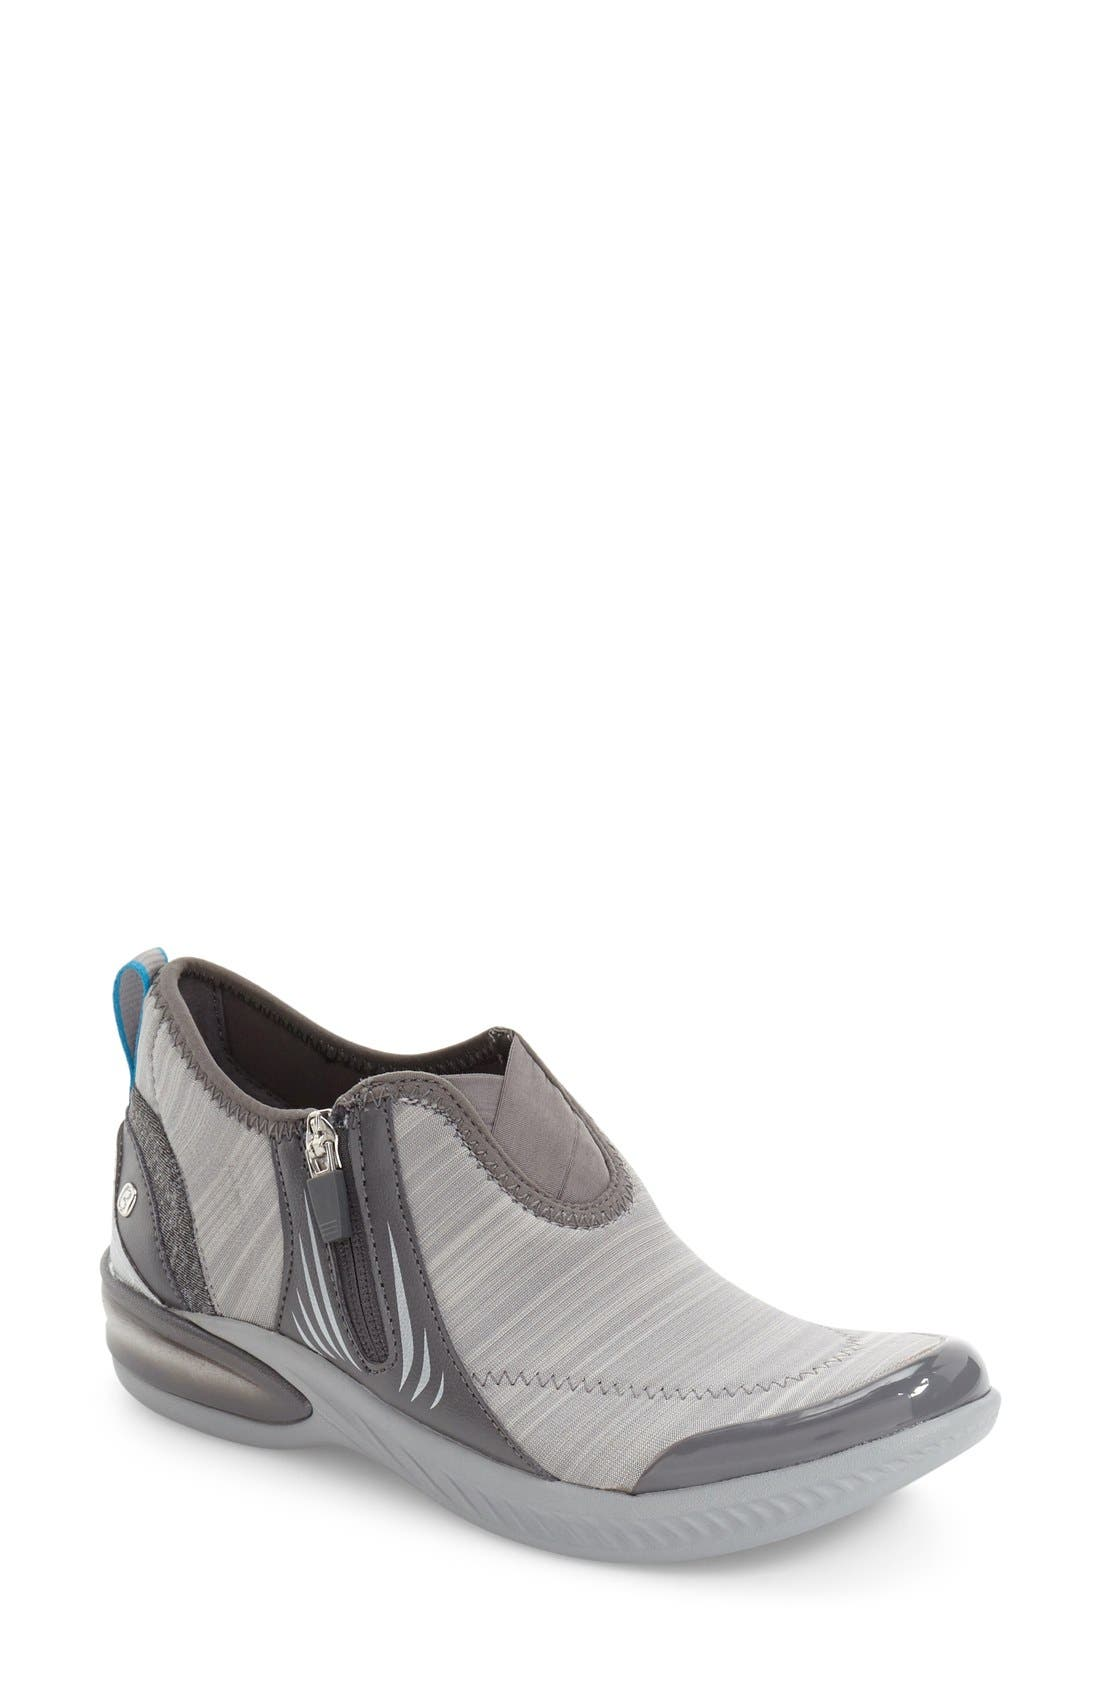 Alternate Image 1 Selected - BZees Nova Midi Sneaker (Women)